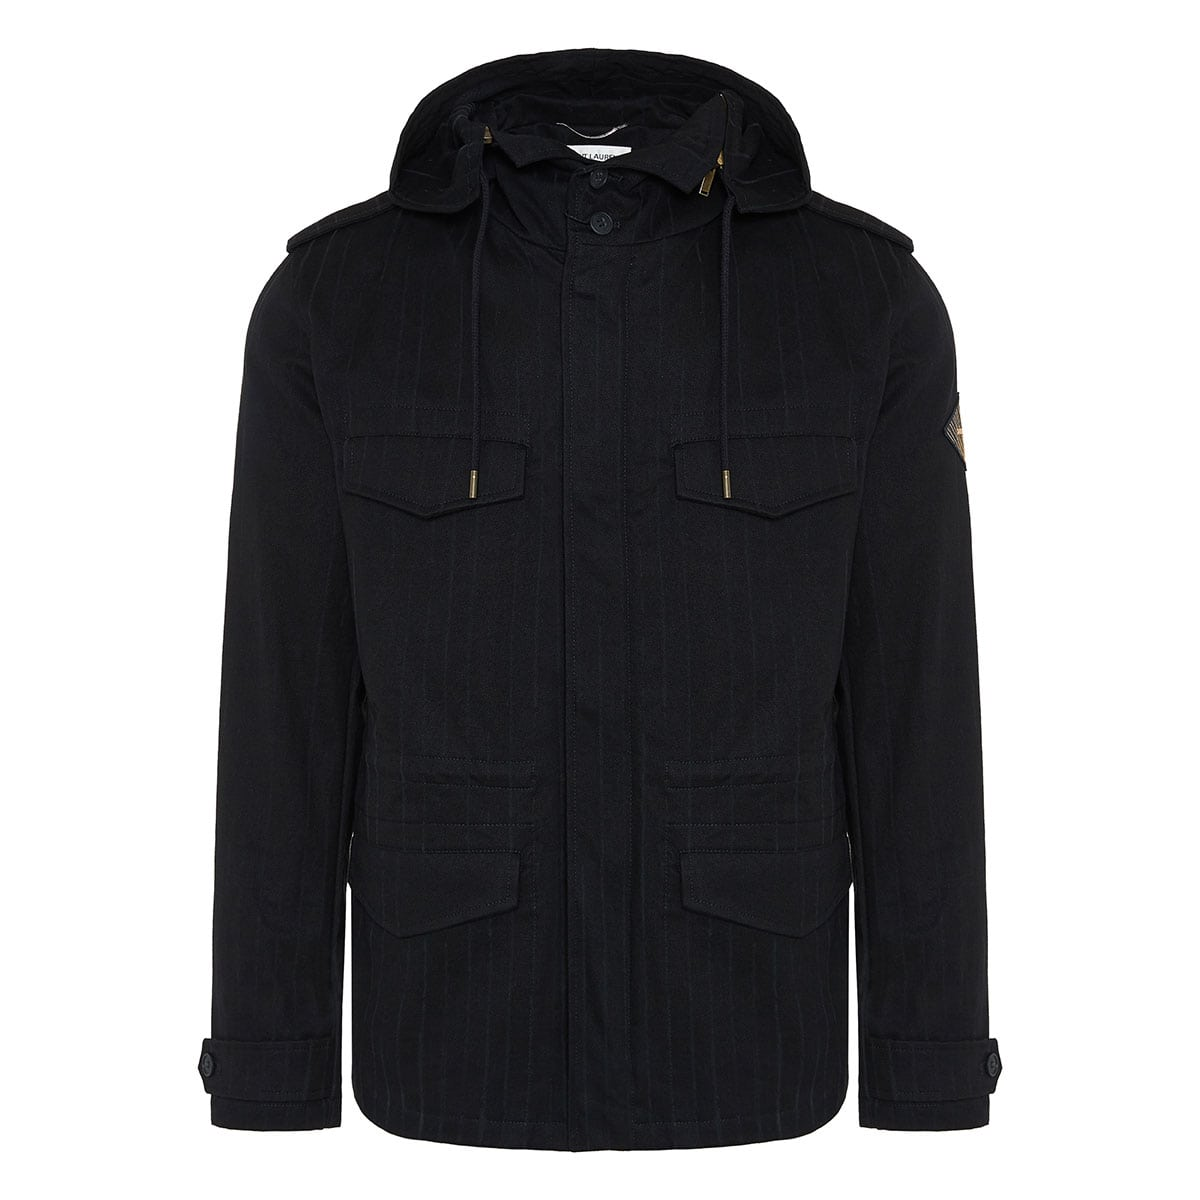 Military striped parka jacket